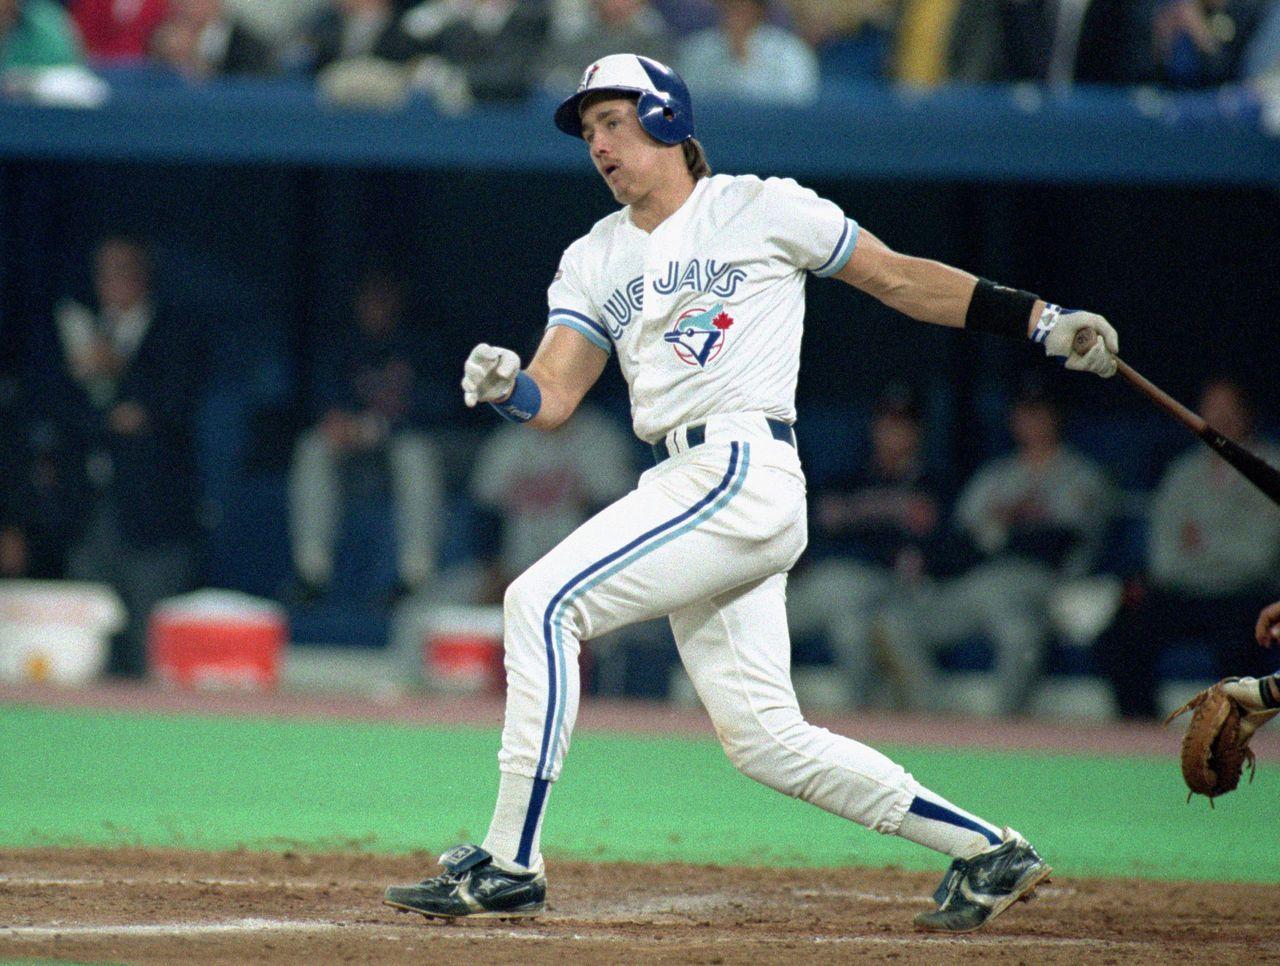 30 C Pat Borders 1992 World Series Mvp Toronto Blue Jays Blue Jays Baseball Blue Jays